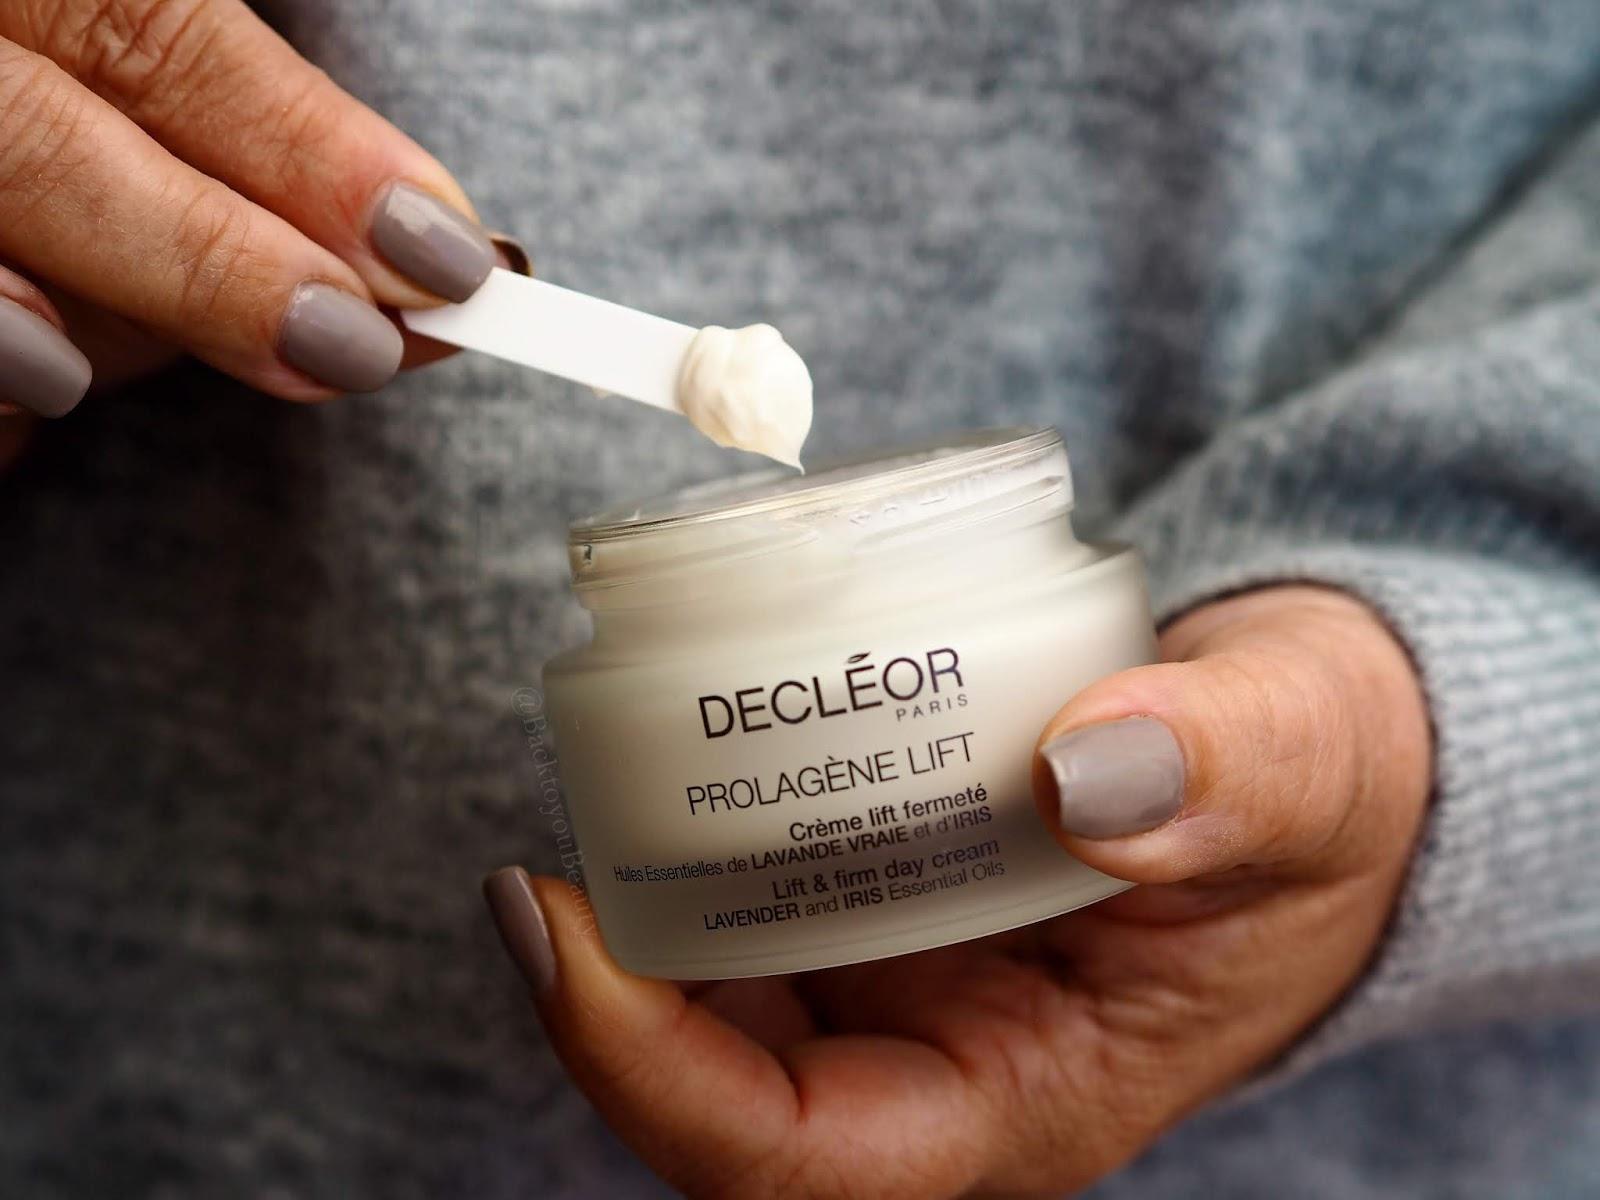 Decleor prolegene lift day cream